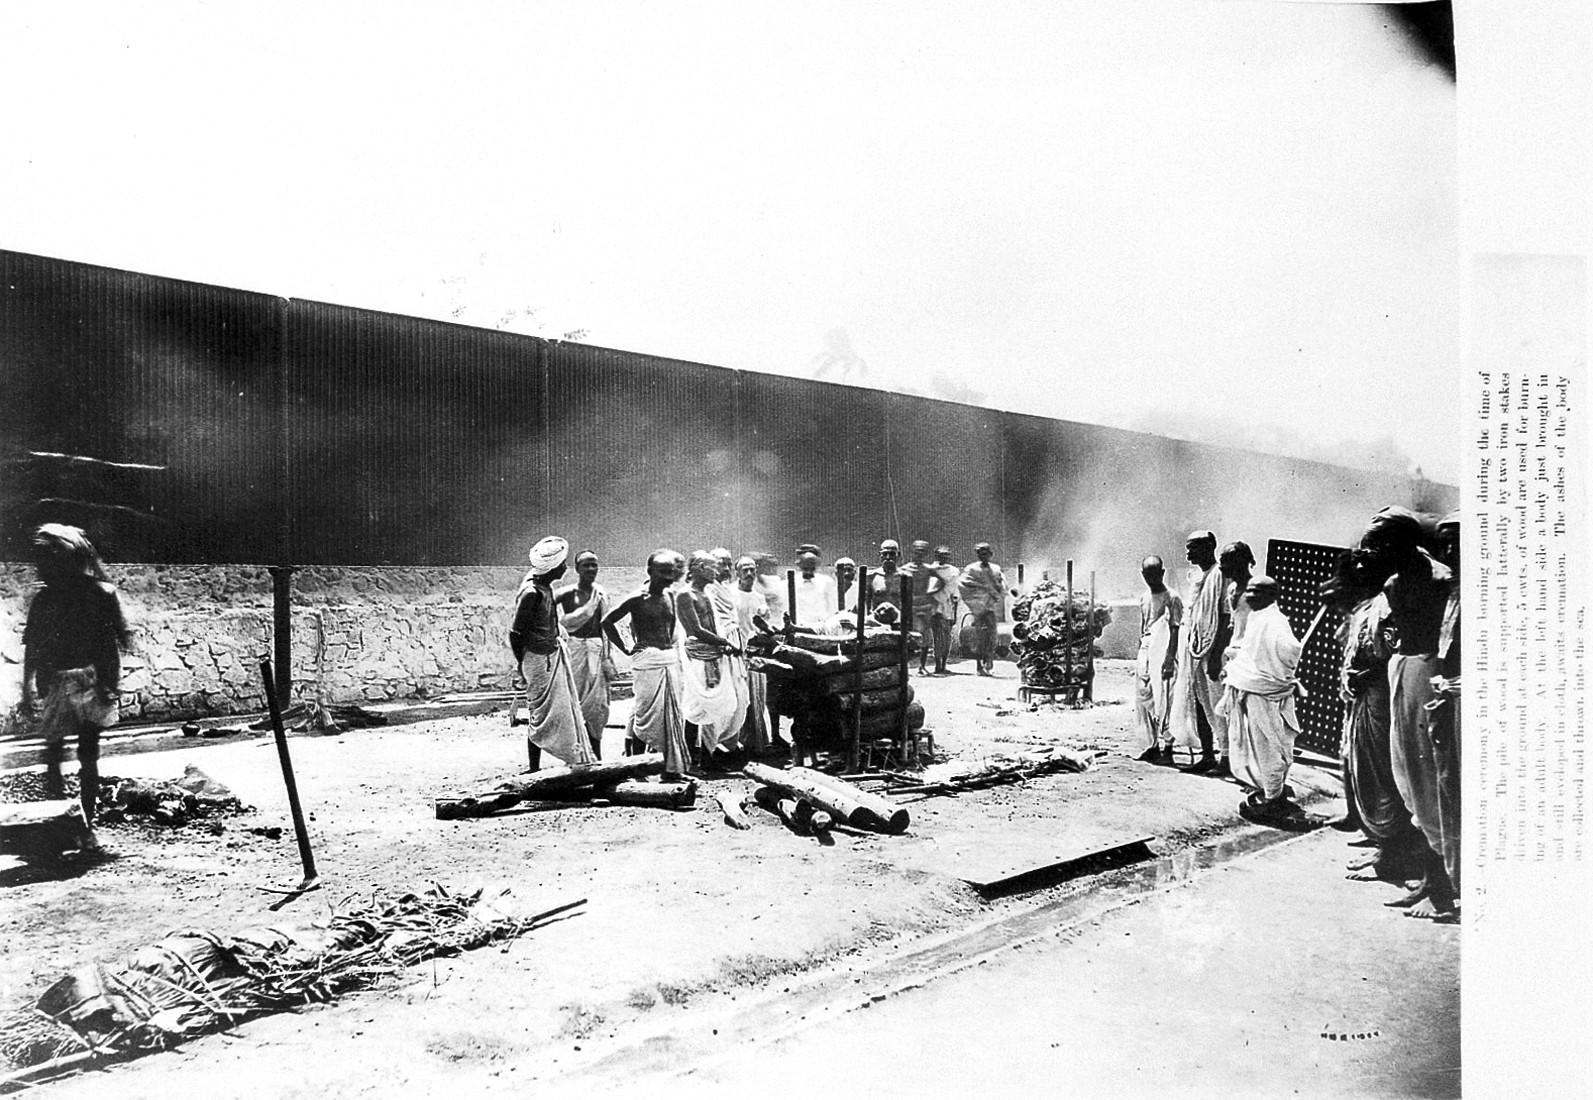 File:Plague epidemic, Bombay, 1896-7 Wellcome L0013983.jpg - Wikimedia  Commons